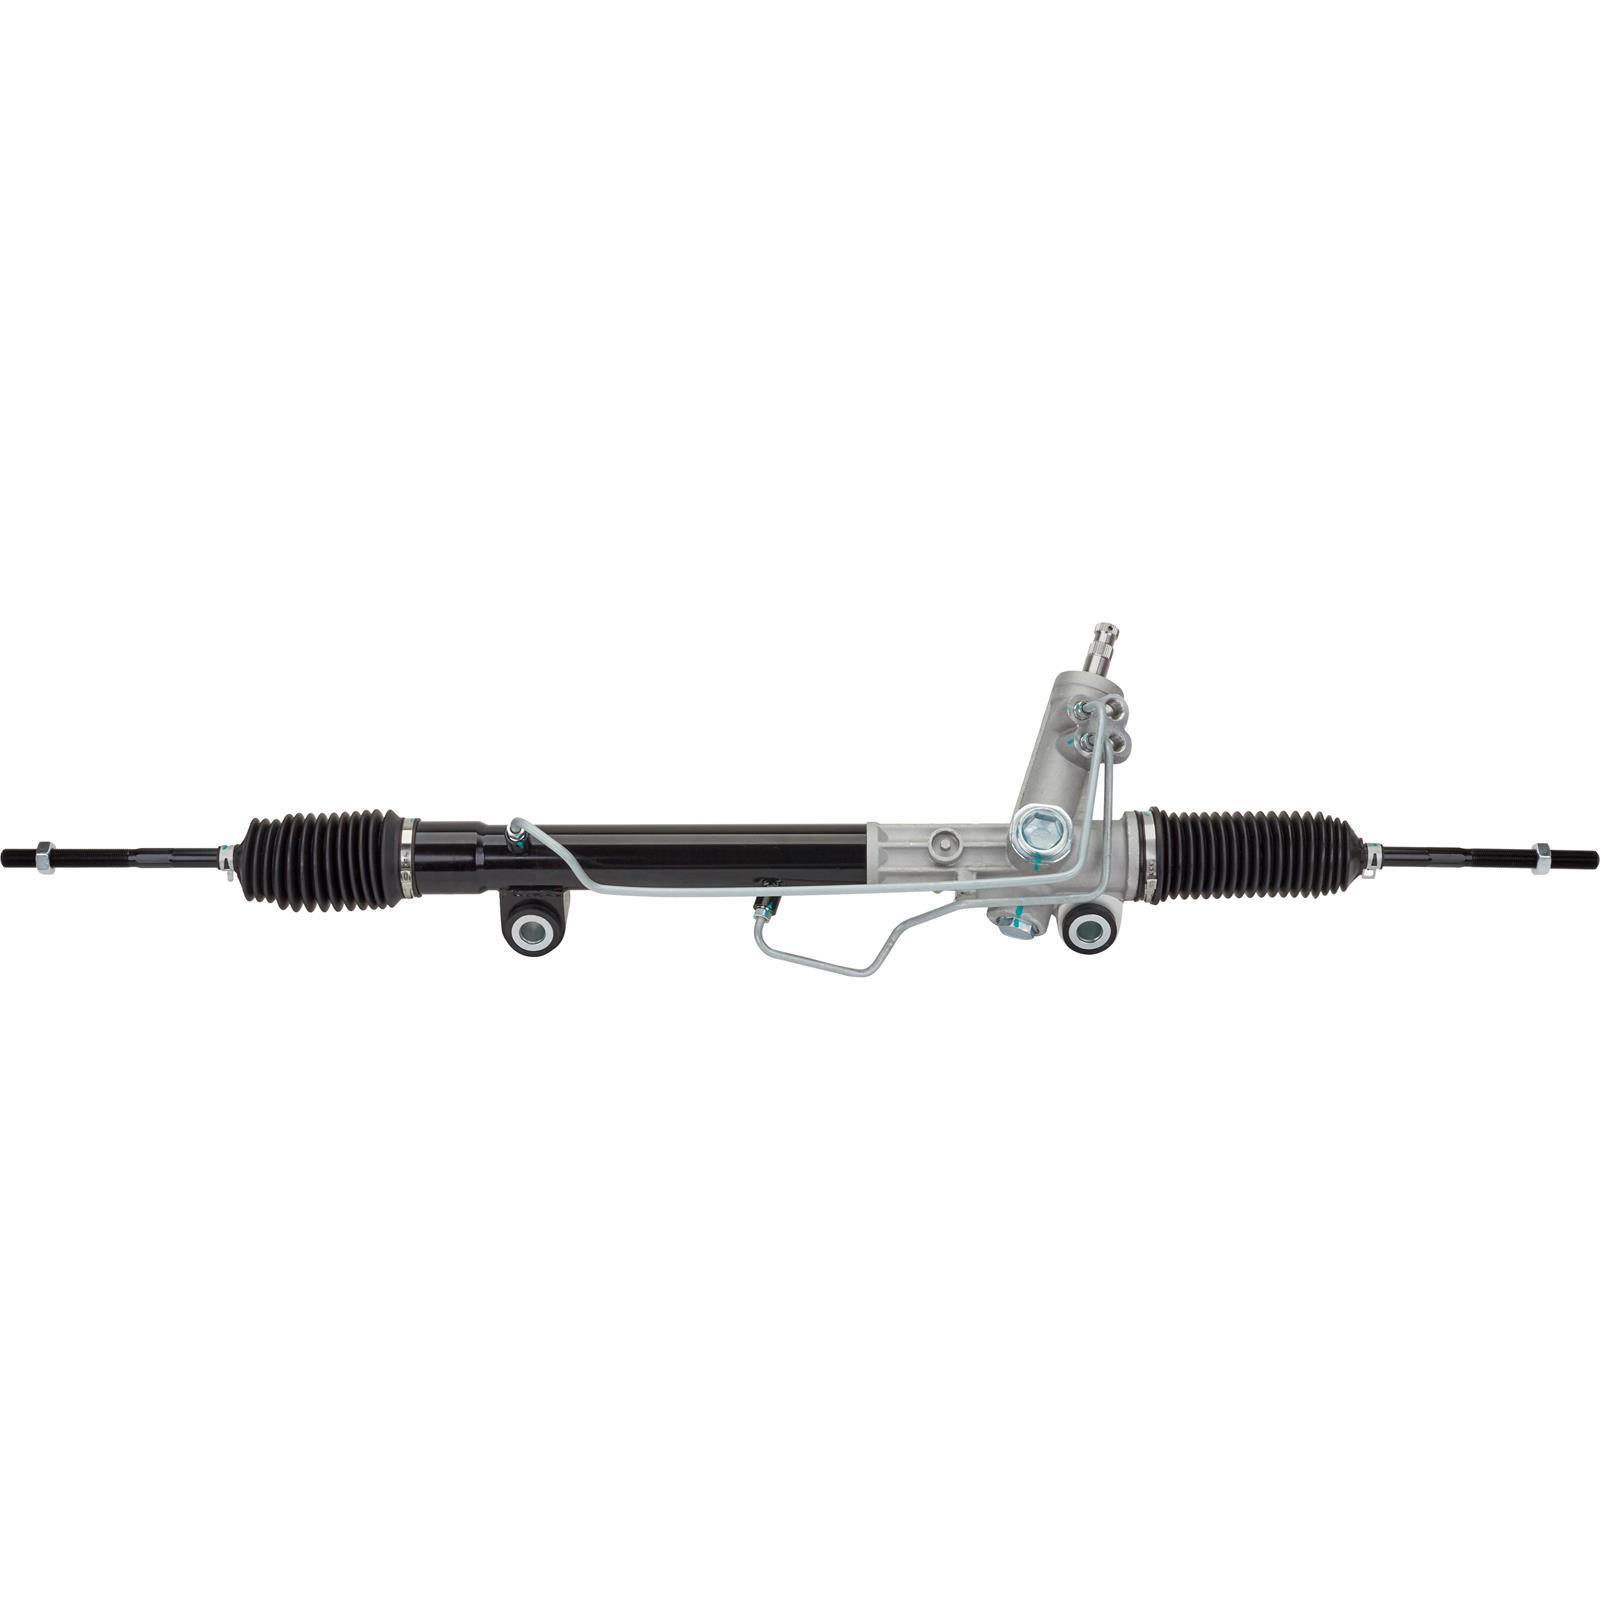 Mustang ll Manual Steering Rack & Pinion 9/16-26 Spline